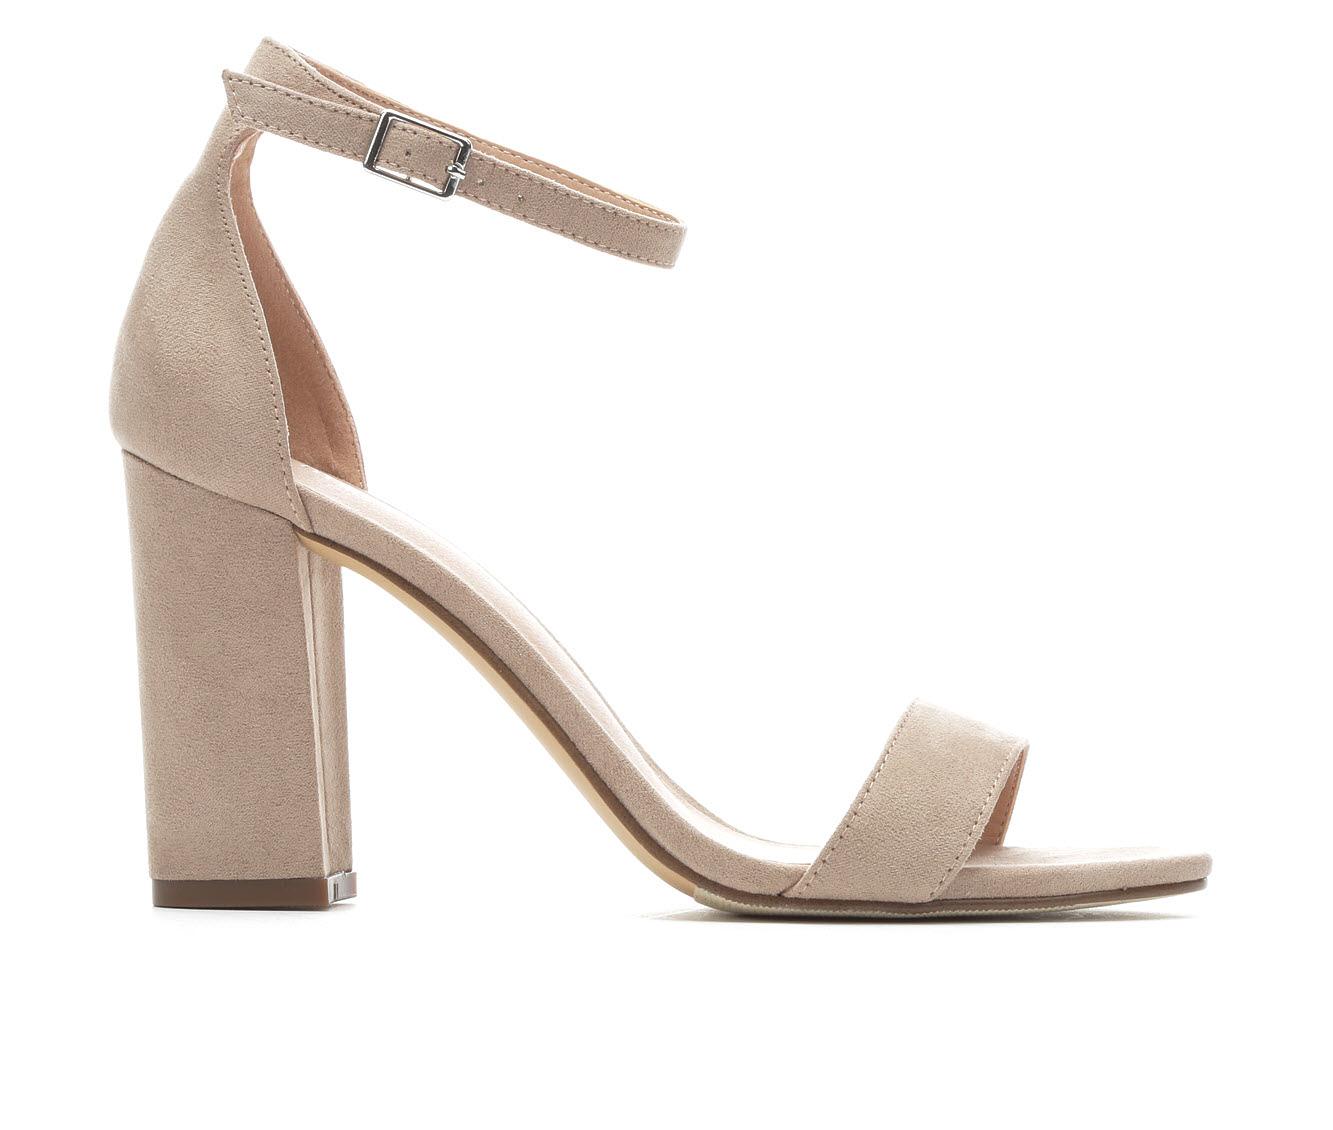 Madden Girl Beella Women's Dress Shoe (Pink Faux Leather)